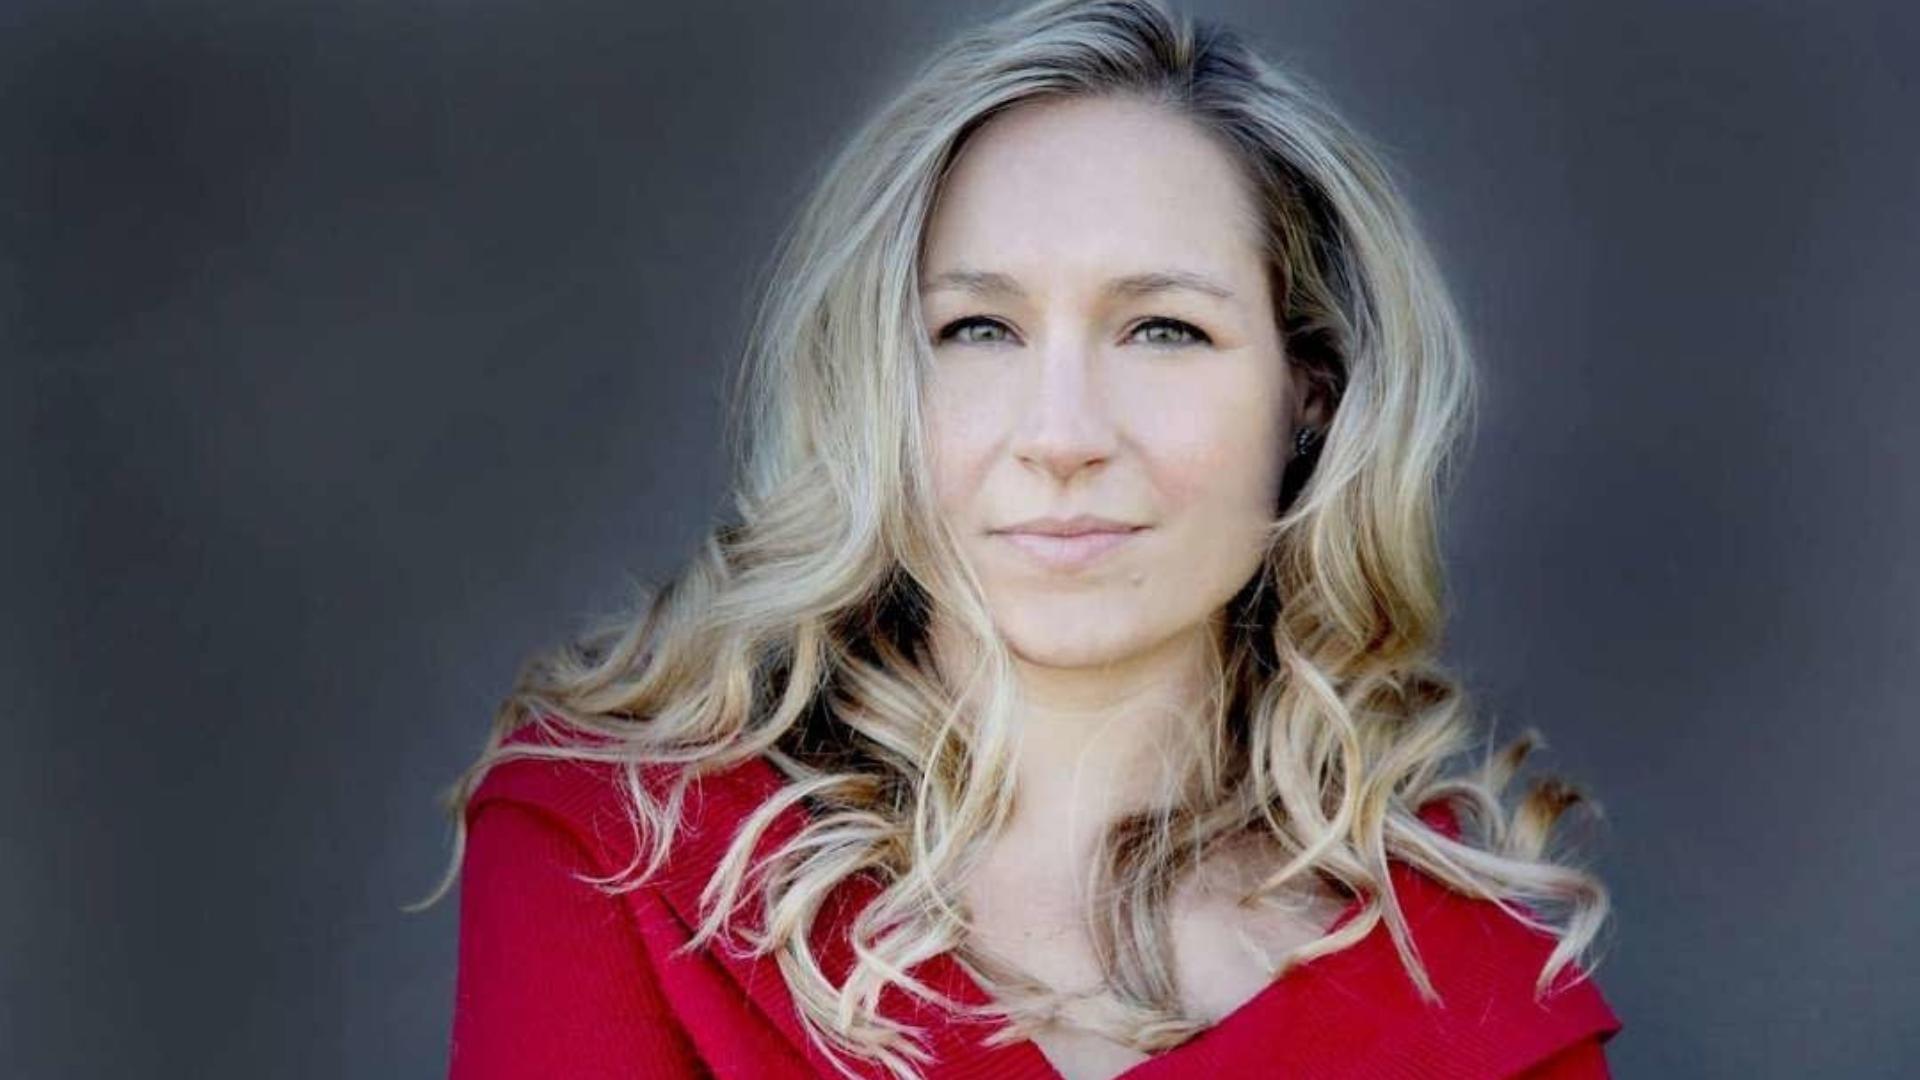 Minnesota composer Jocelyn Hagen